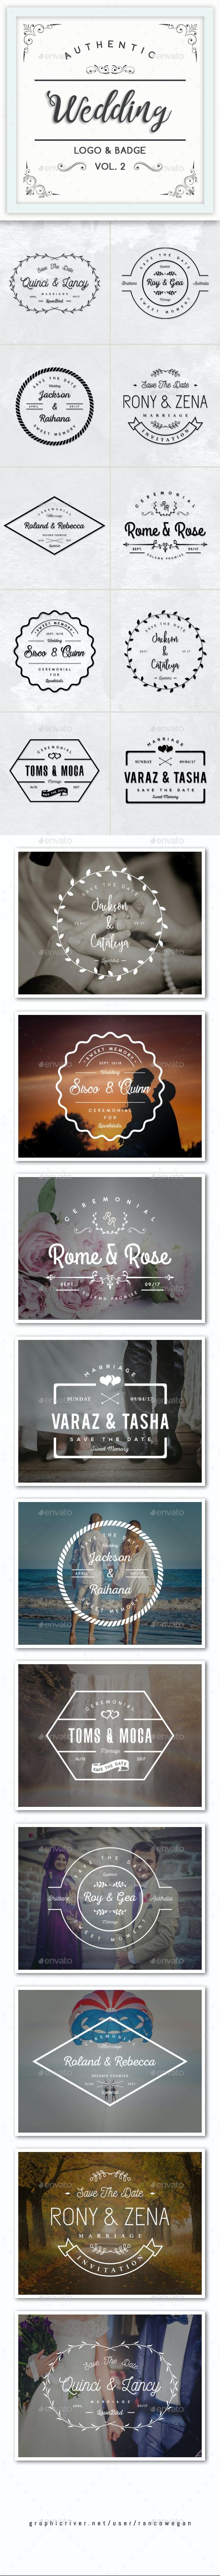 Authentic Wedding Logo & Badge Vol. 2 - Badges & Stickers Web Elements